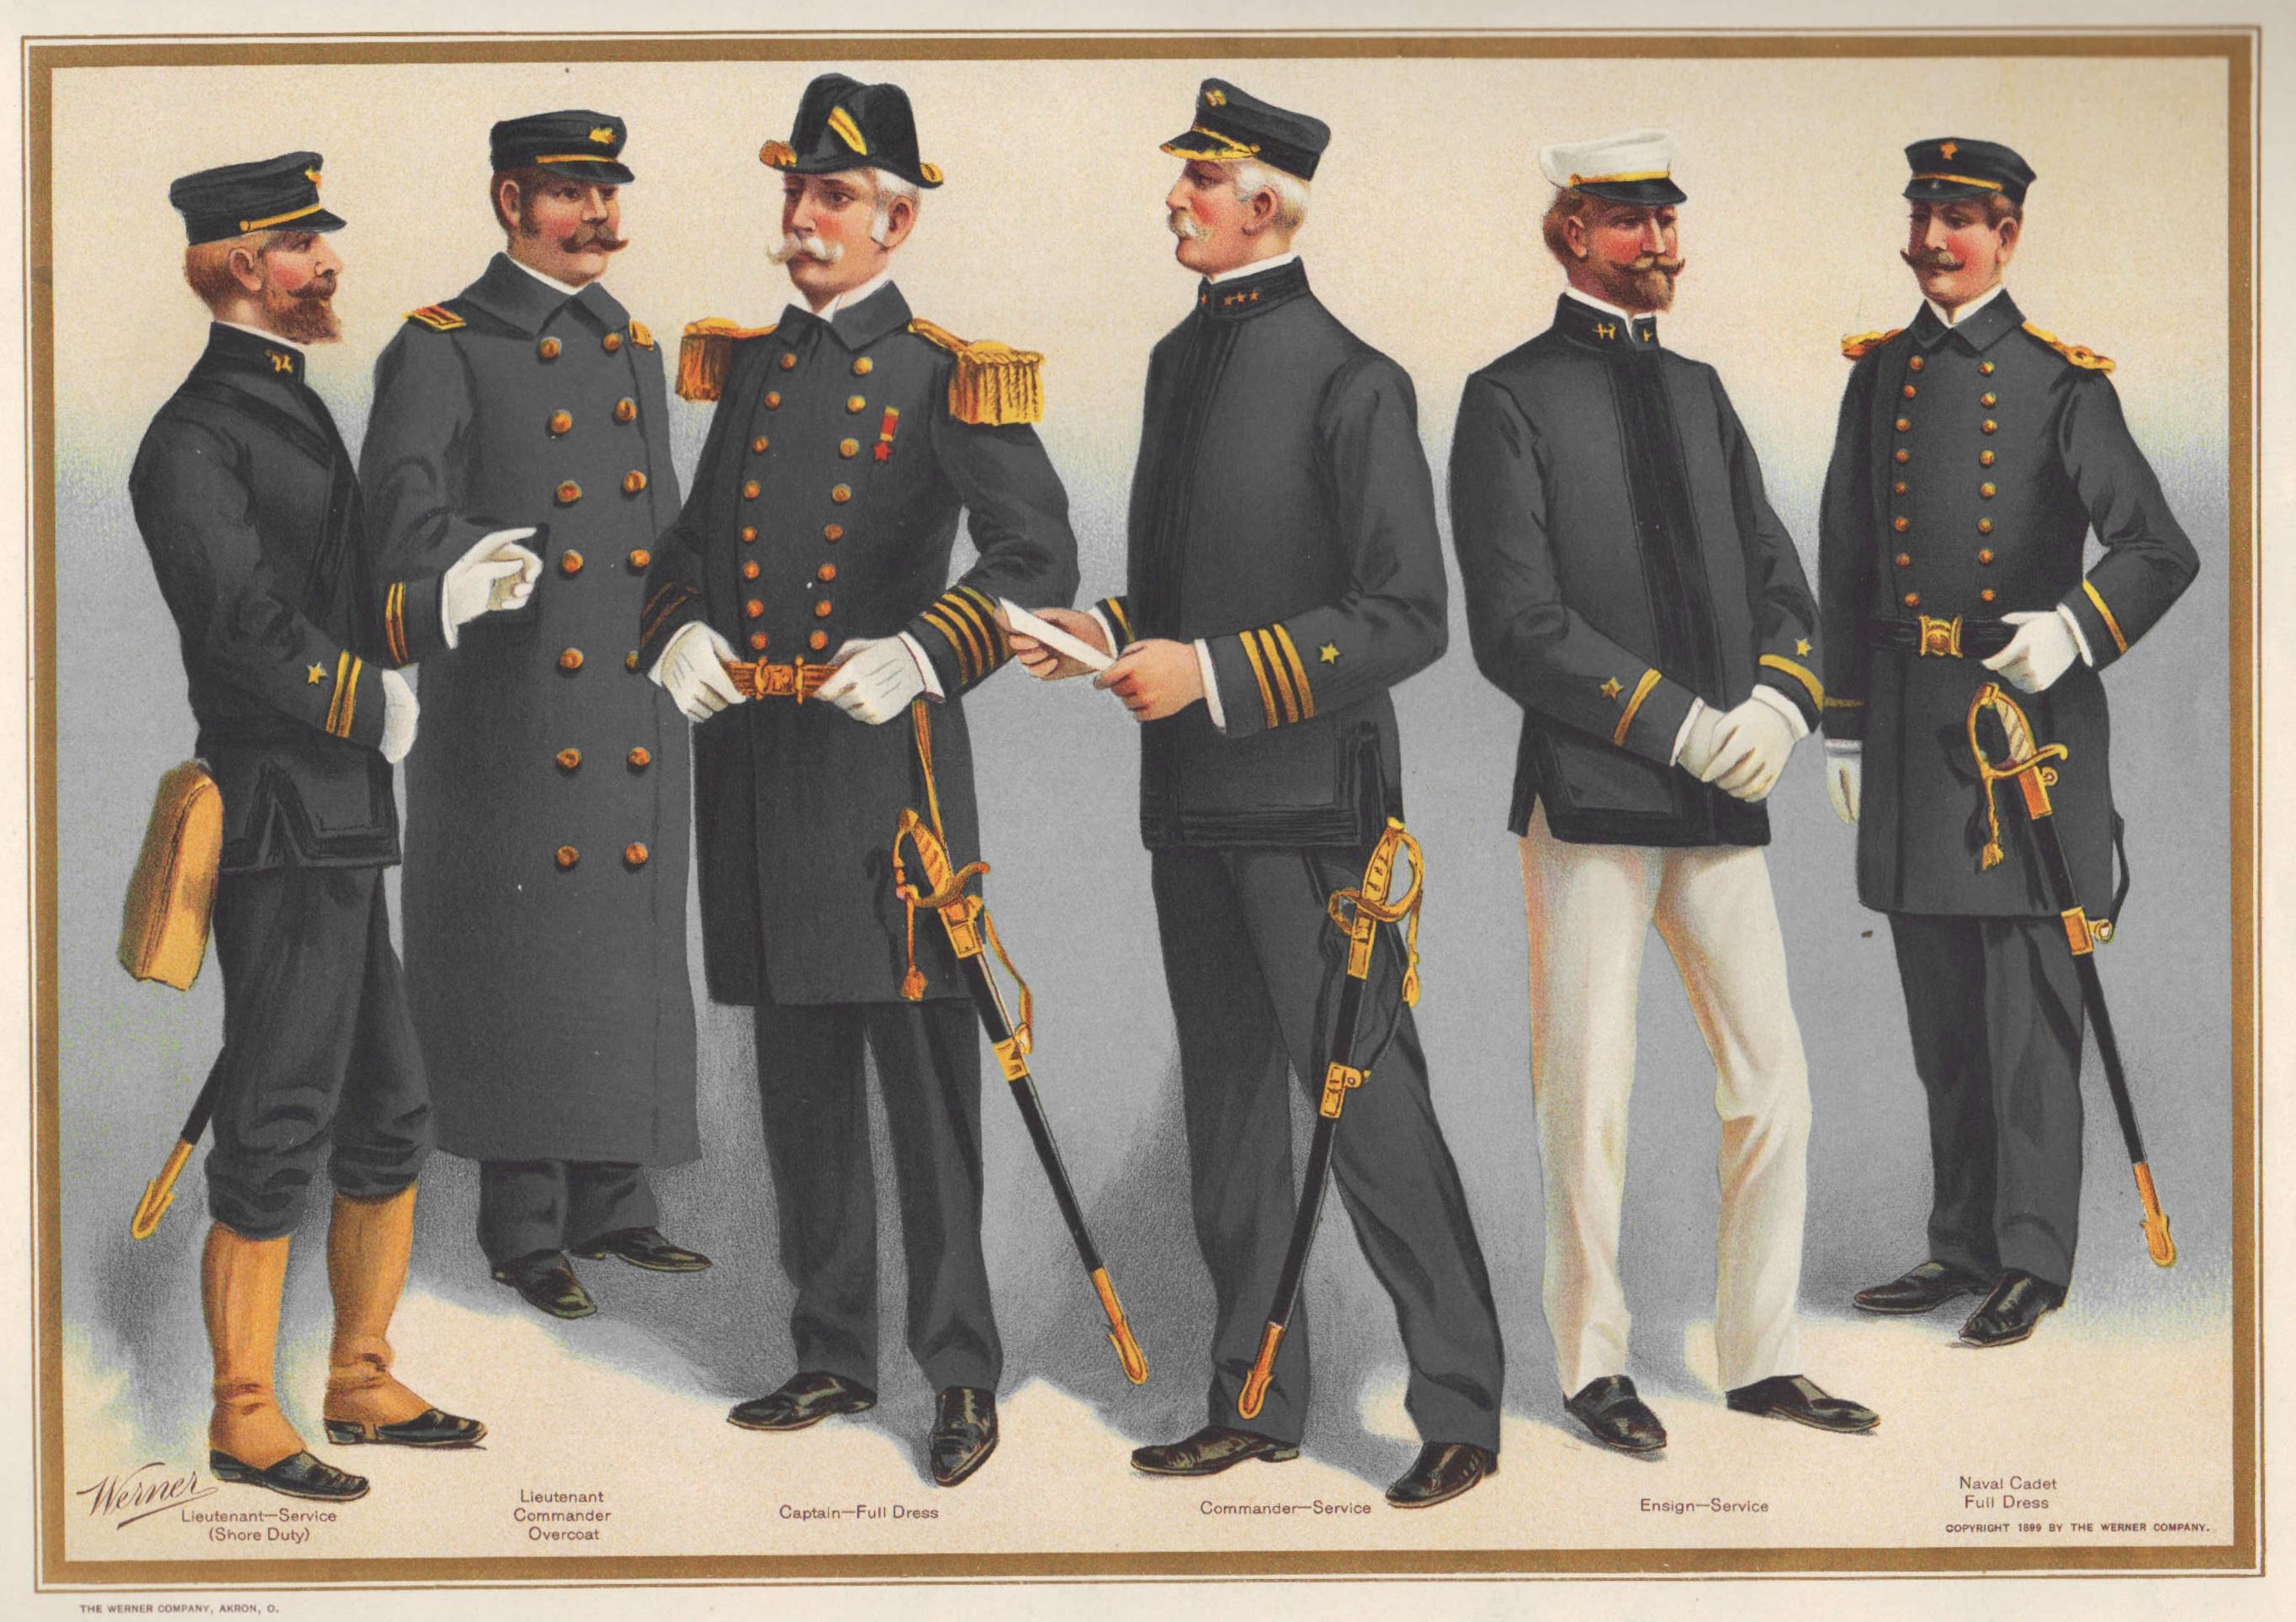 Collectibles Independent Us Navy Ltcdr Dress Blue Uniform Vintage